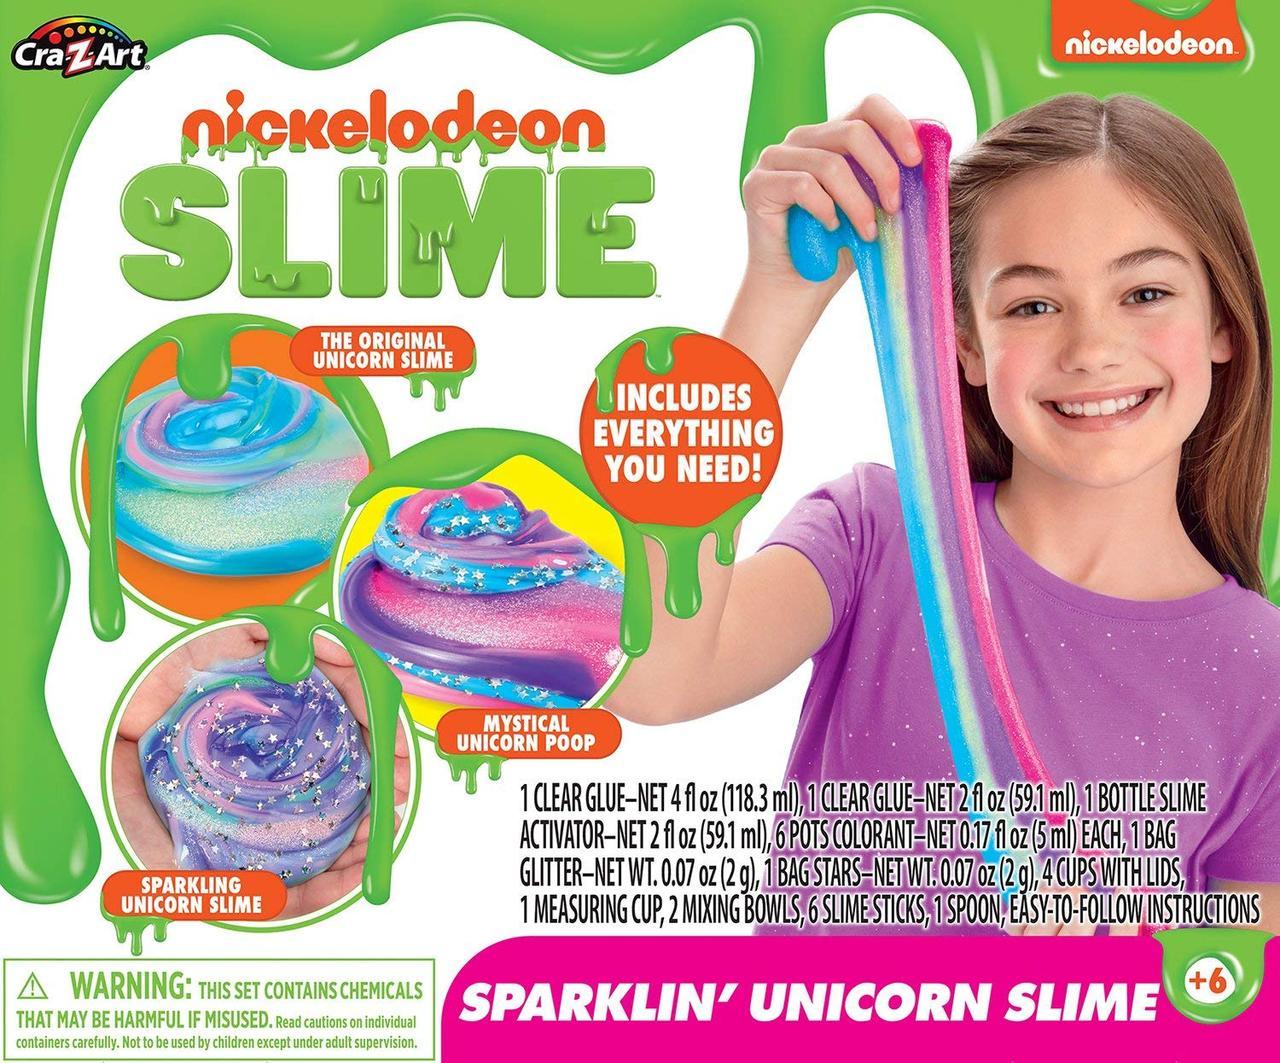 Набор Cra-Z-Art для создания блестящего слайма Едиорога. Nickelodeon Ultimate DIY Unicorn Slime Kit